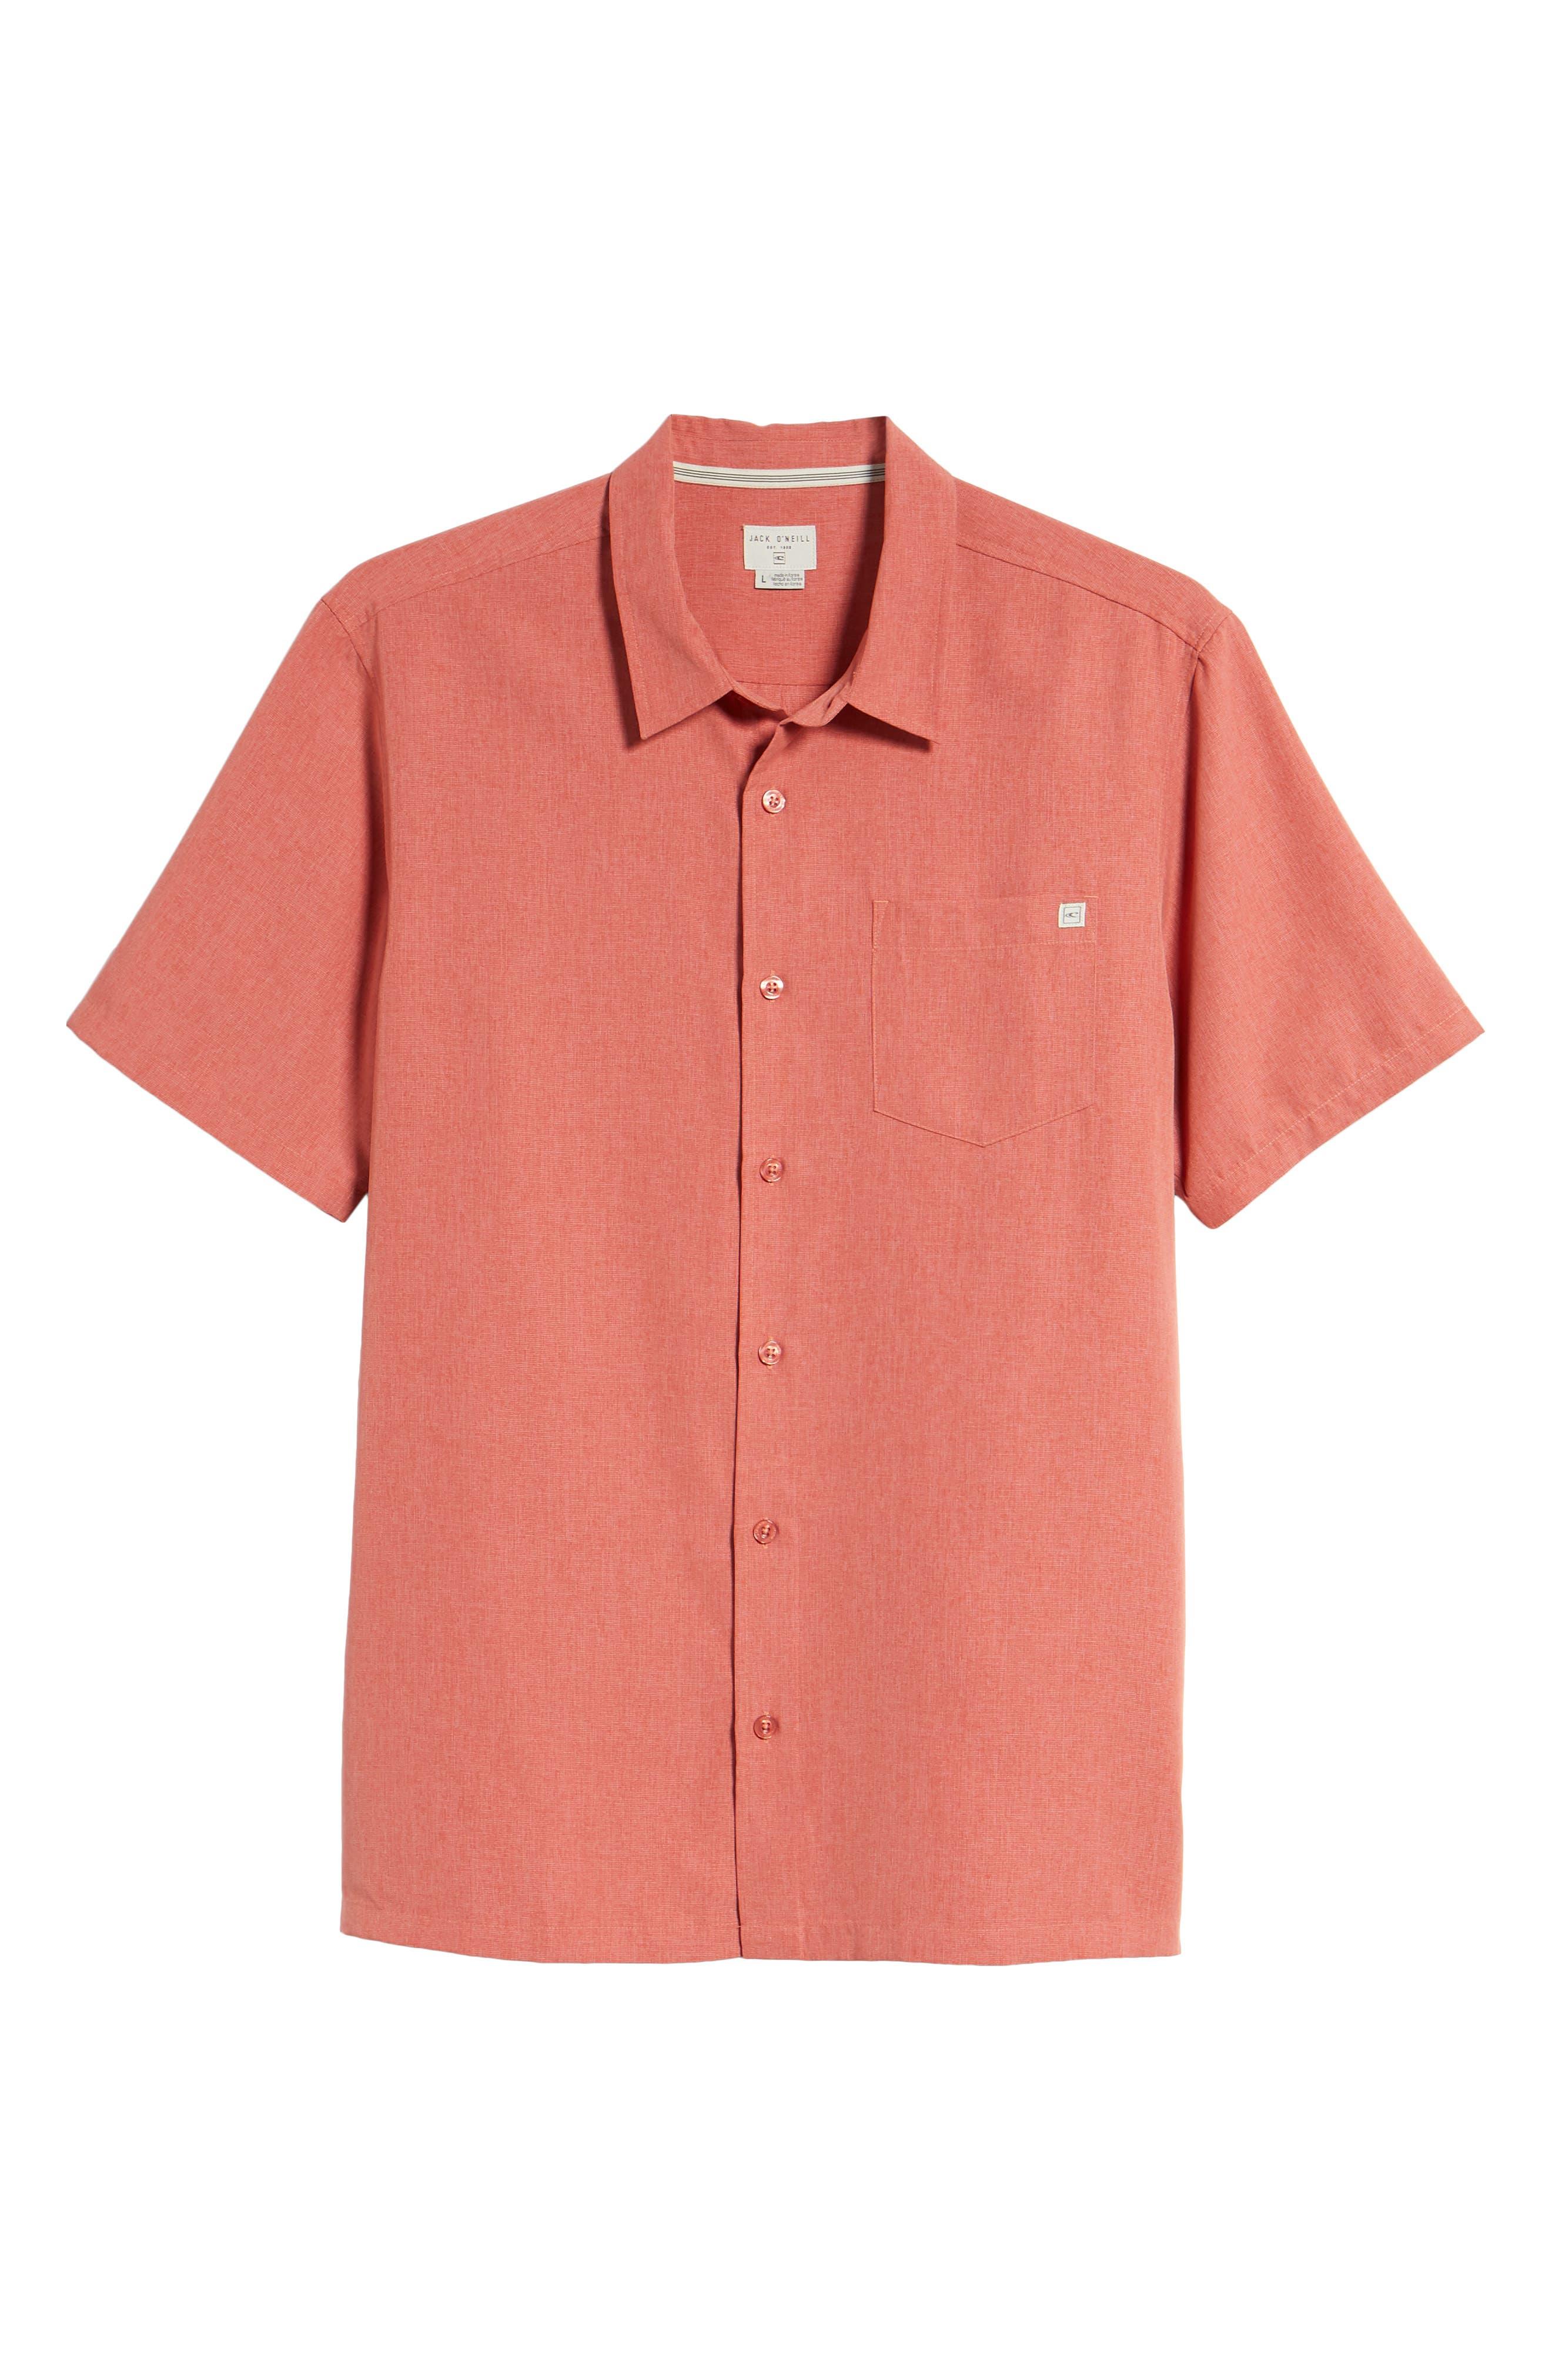 Liberty Sport Shirt,                             Alternate thumbnail 6, color,                             Spice